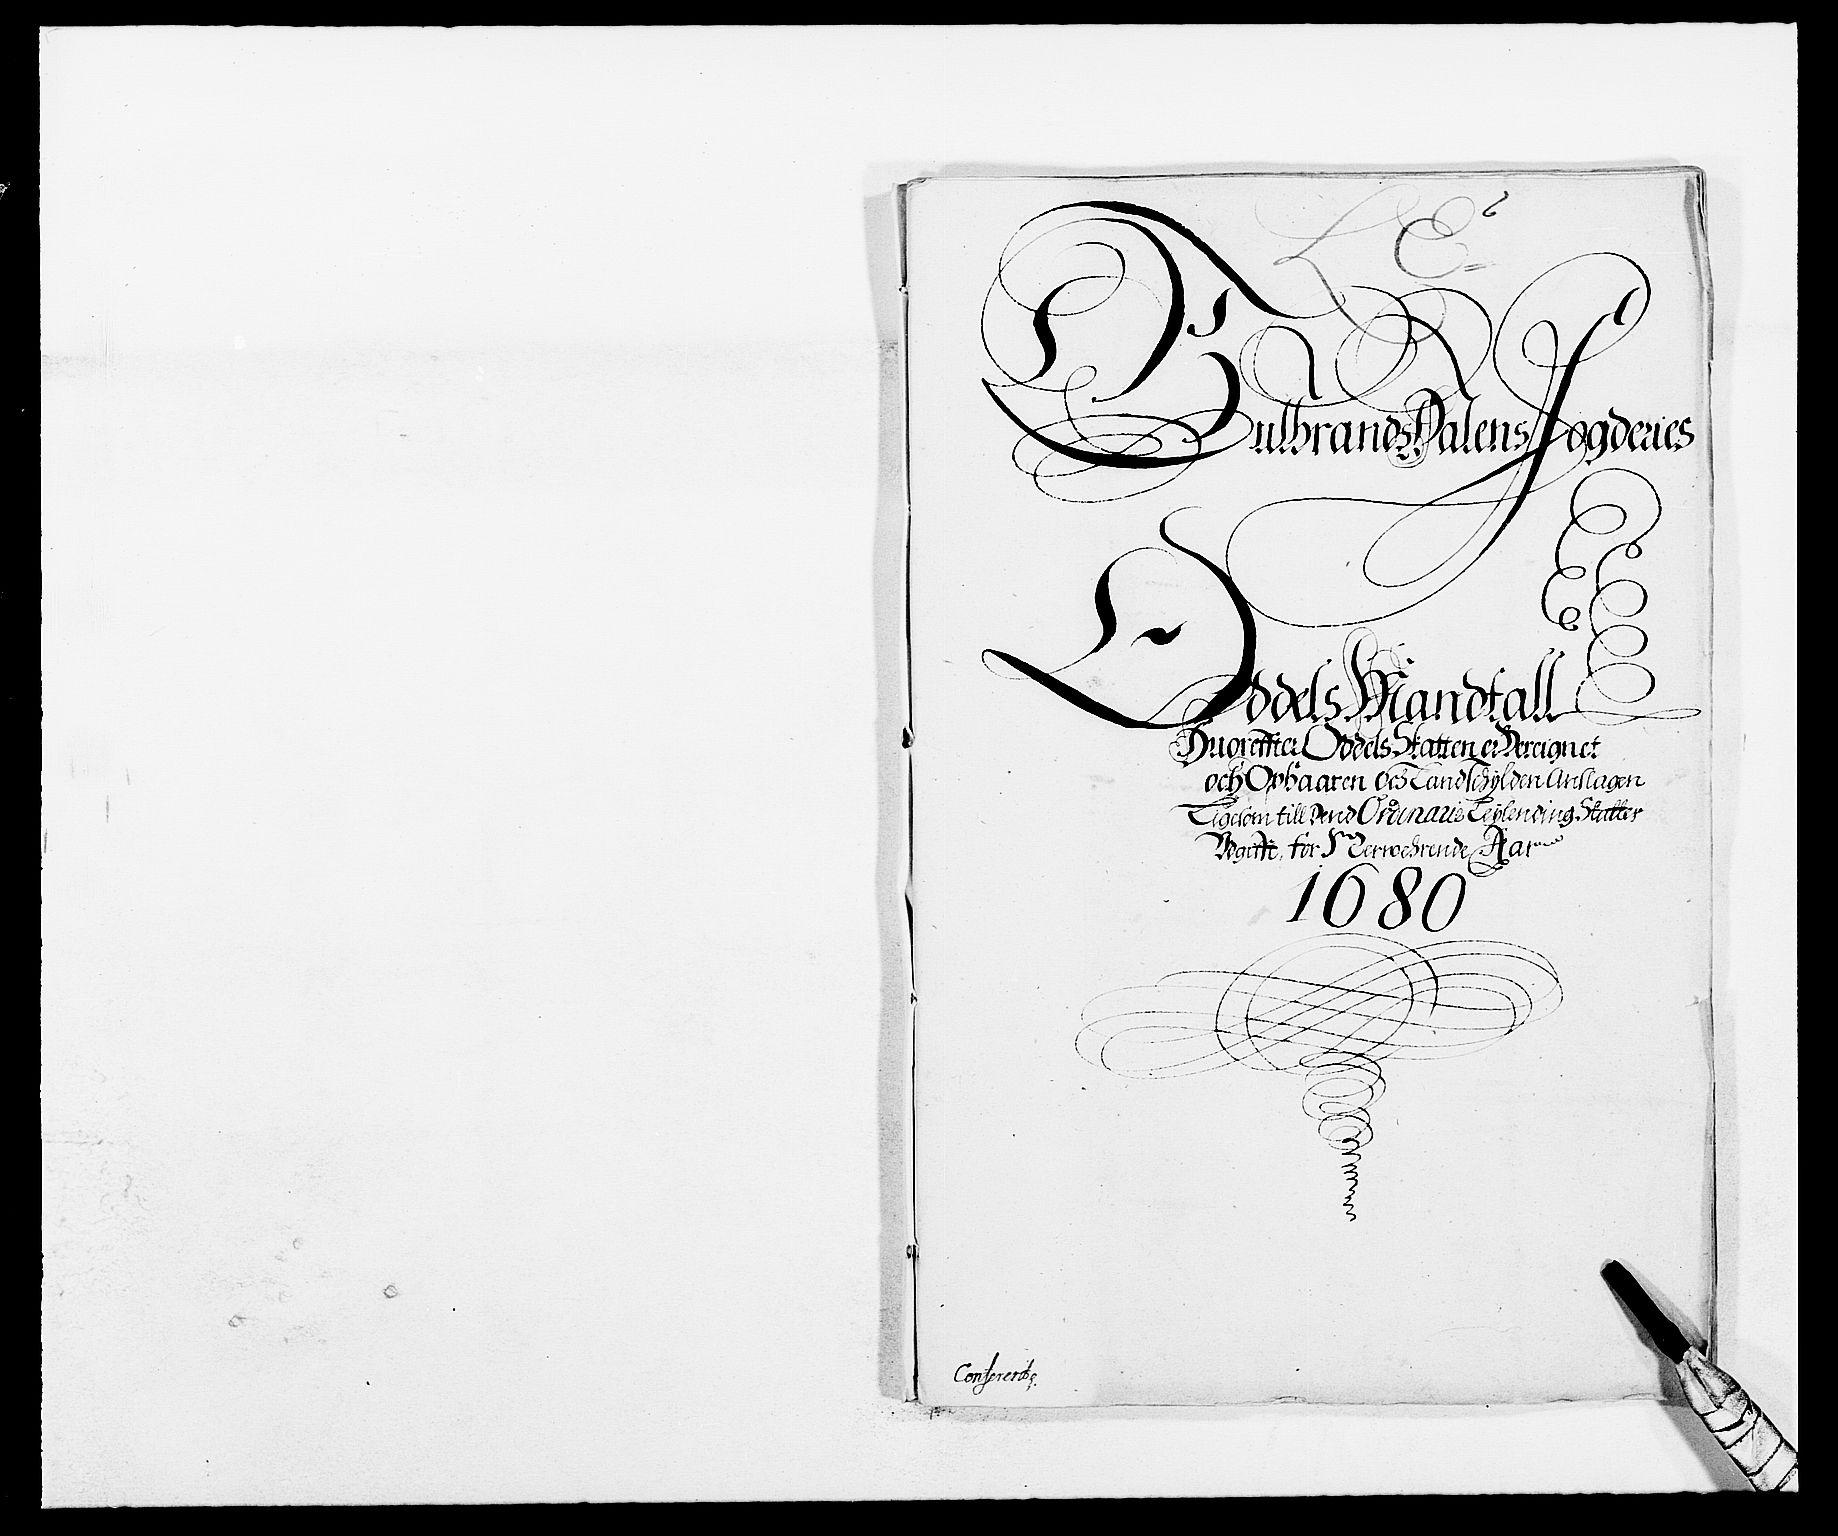 RA, Rentekammeret inntil 1814, Reviderte regnskaper, Fogderegnskap, R17/L1154: Fogderegnskap Gudbrandsdal, 1680, s. 338